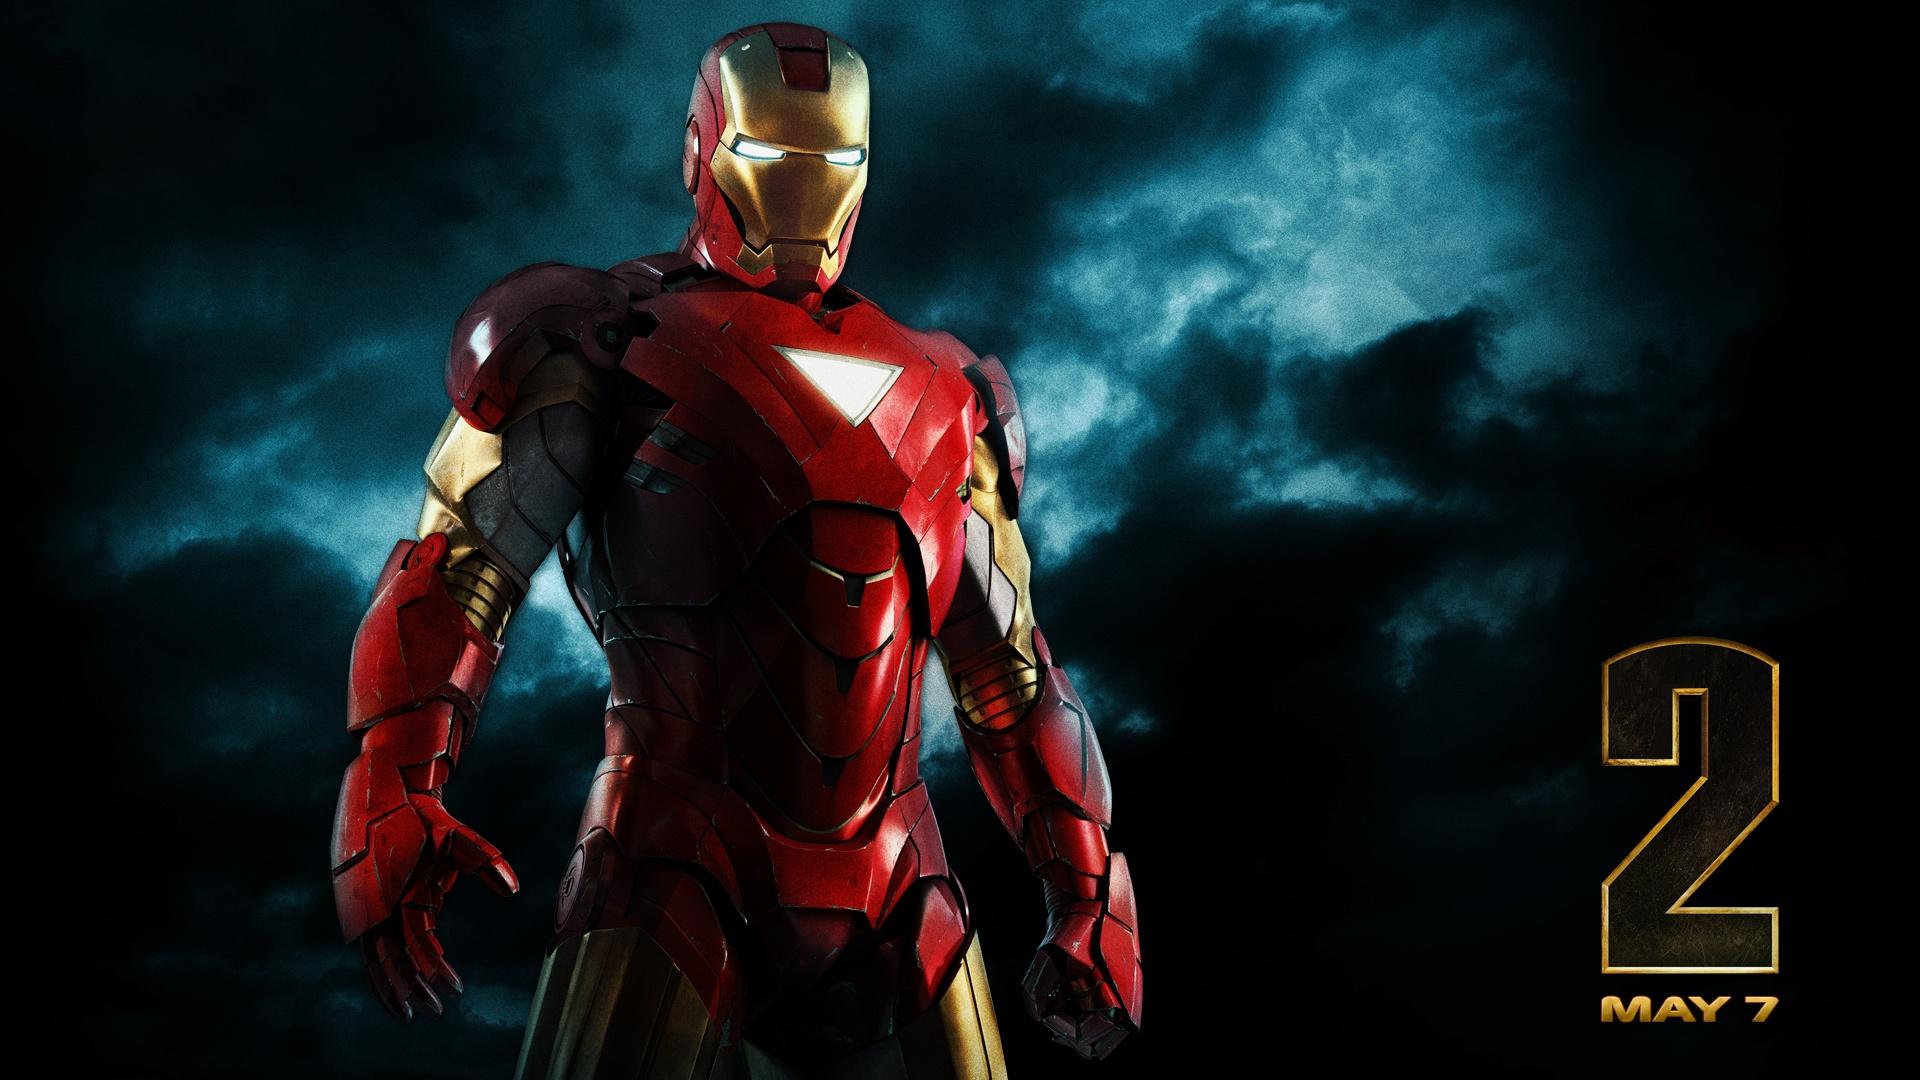 Iron Man Iron Man 2 Marvel Comics Superhero Tony Stark 1920x1080